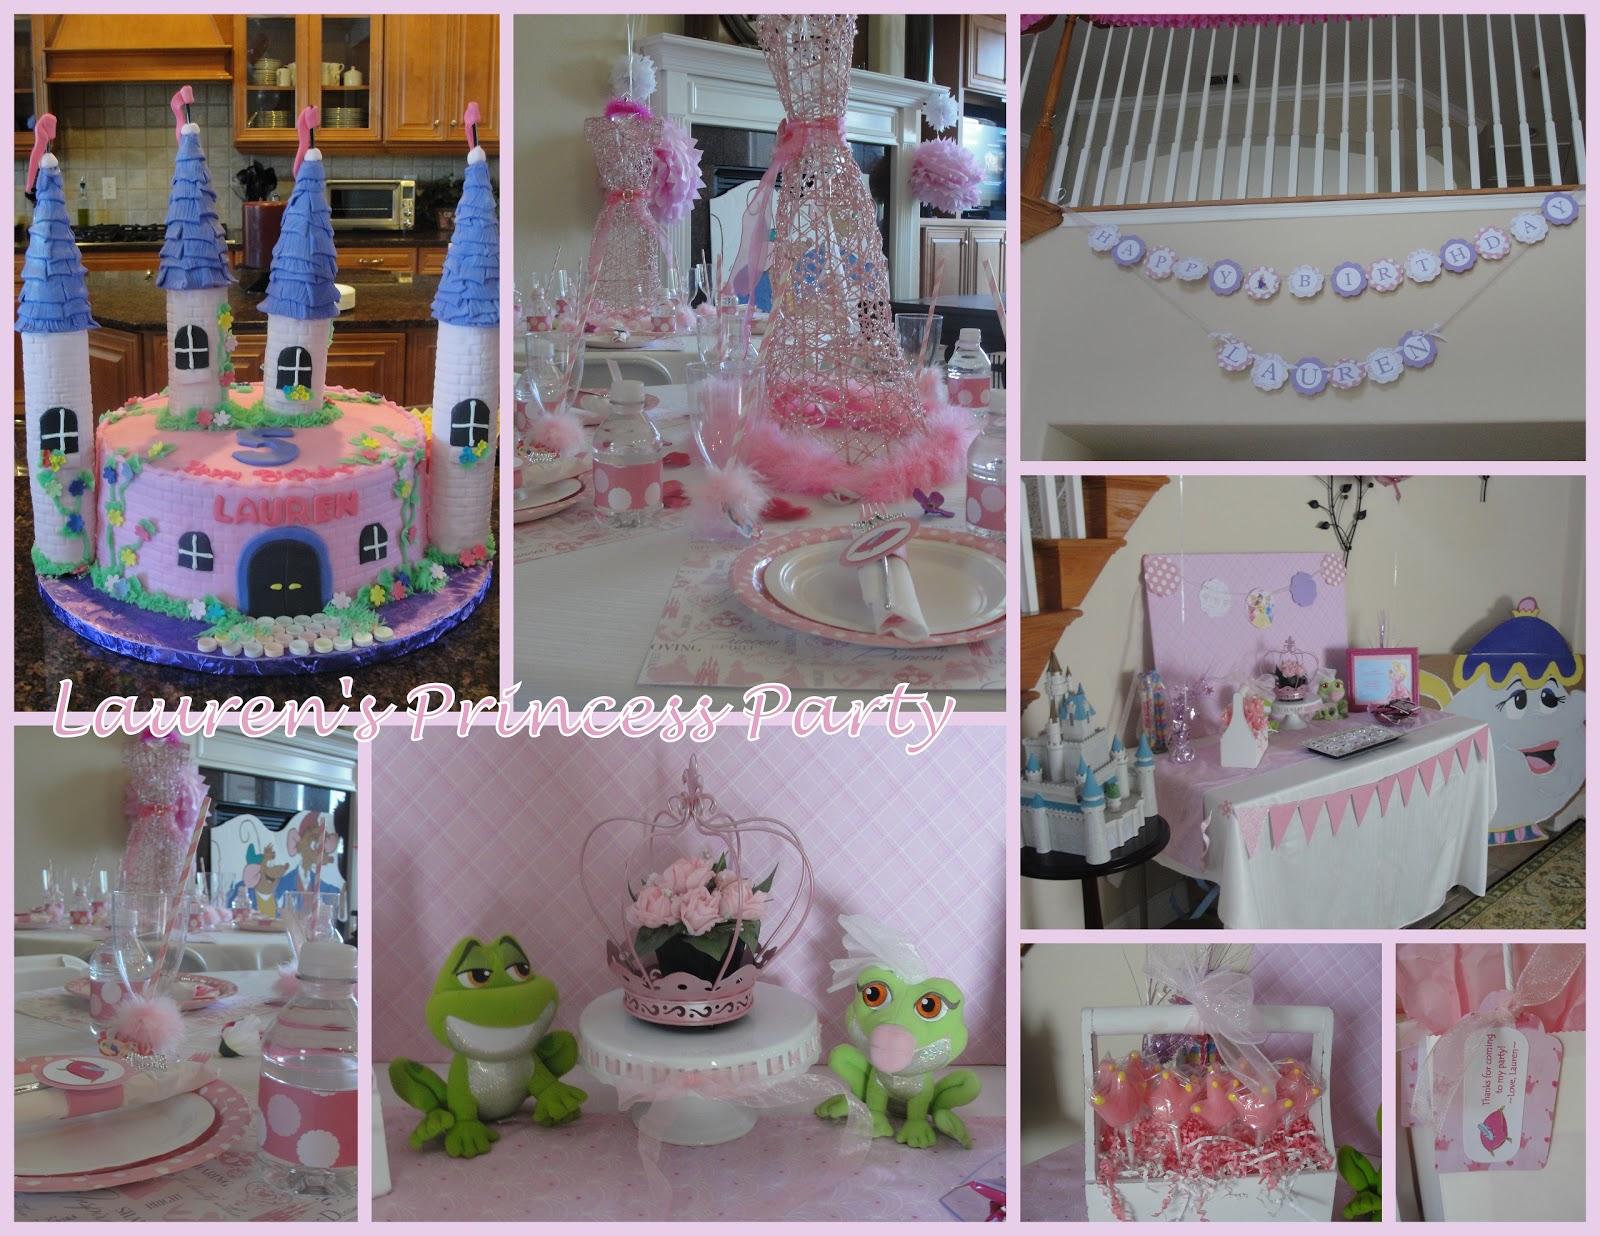 http://3.bp.blogspot.com/-BMQwoBwy3No/T2fYHM2IXgI/AAAAAAAAAbg/7D8iibxLij4/s1600/Princess+Party.jpg